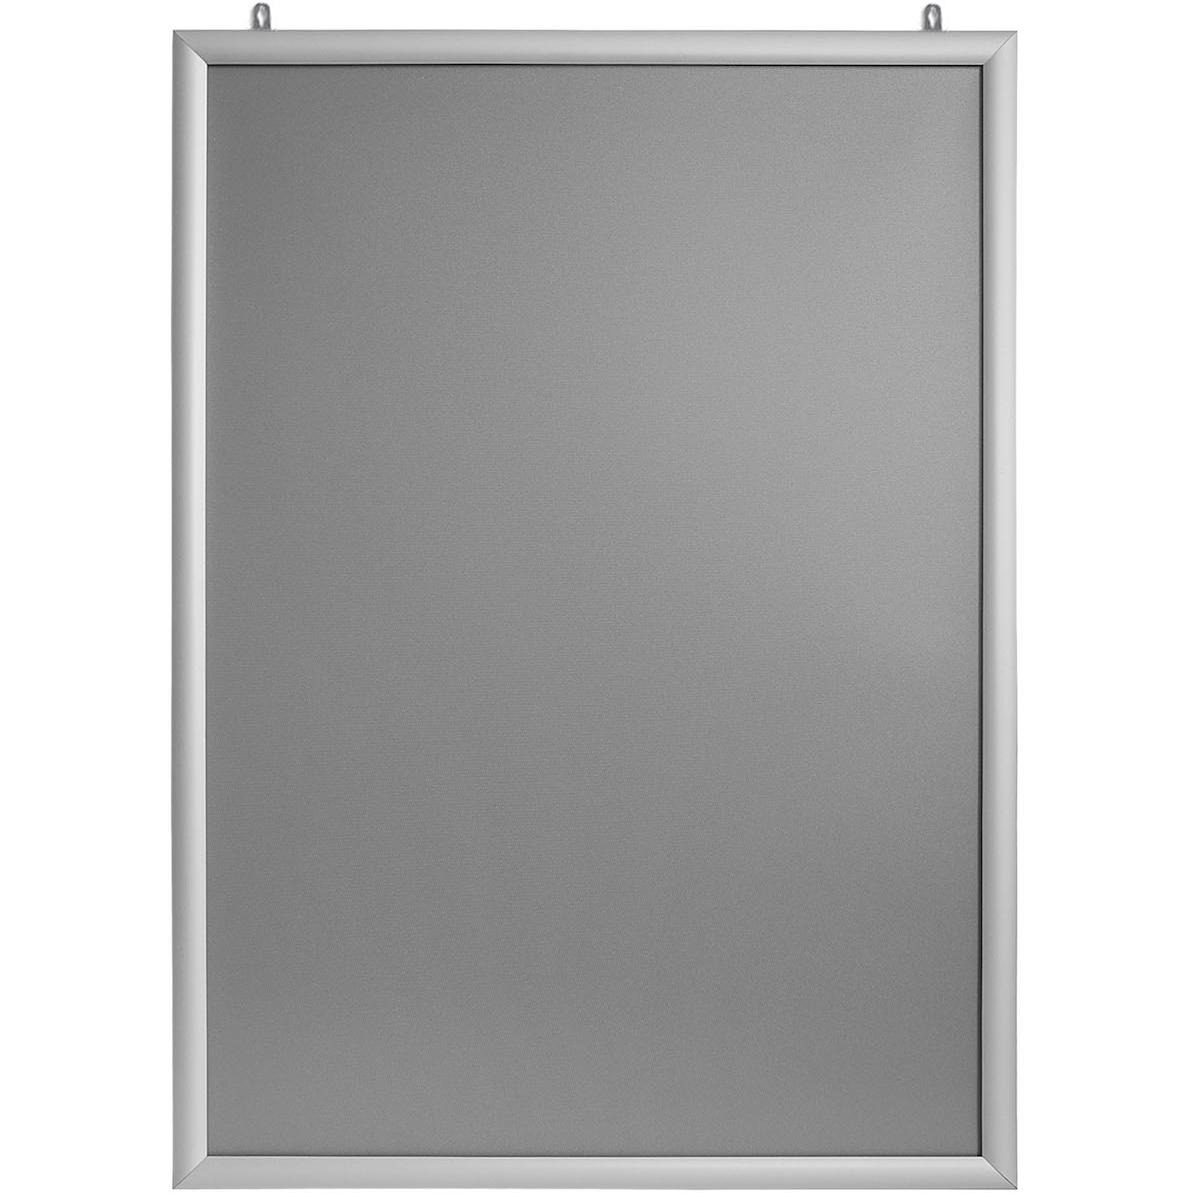 Ramă Click, afișaj ambele fețe S7, JJ DISPLAYS, 700 x 1000 mm